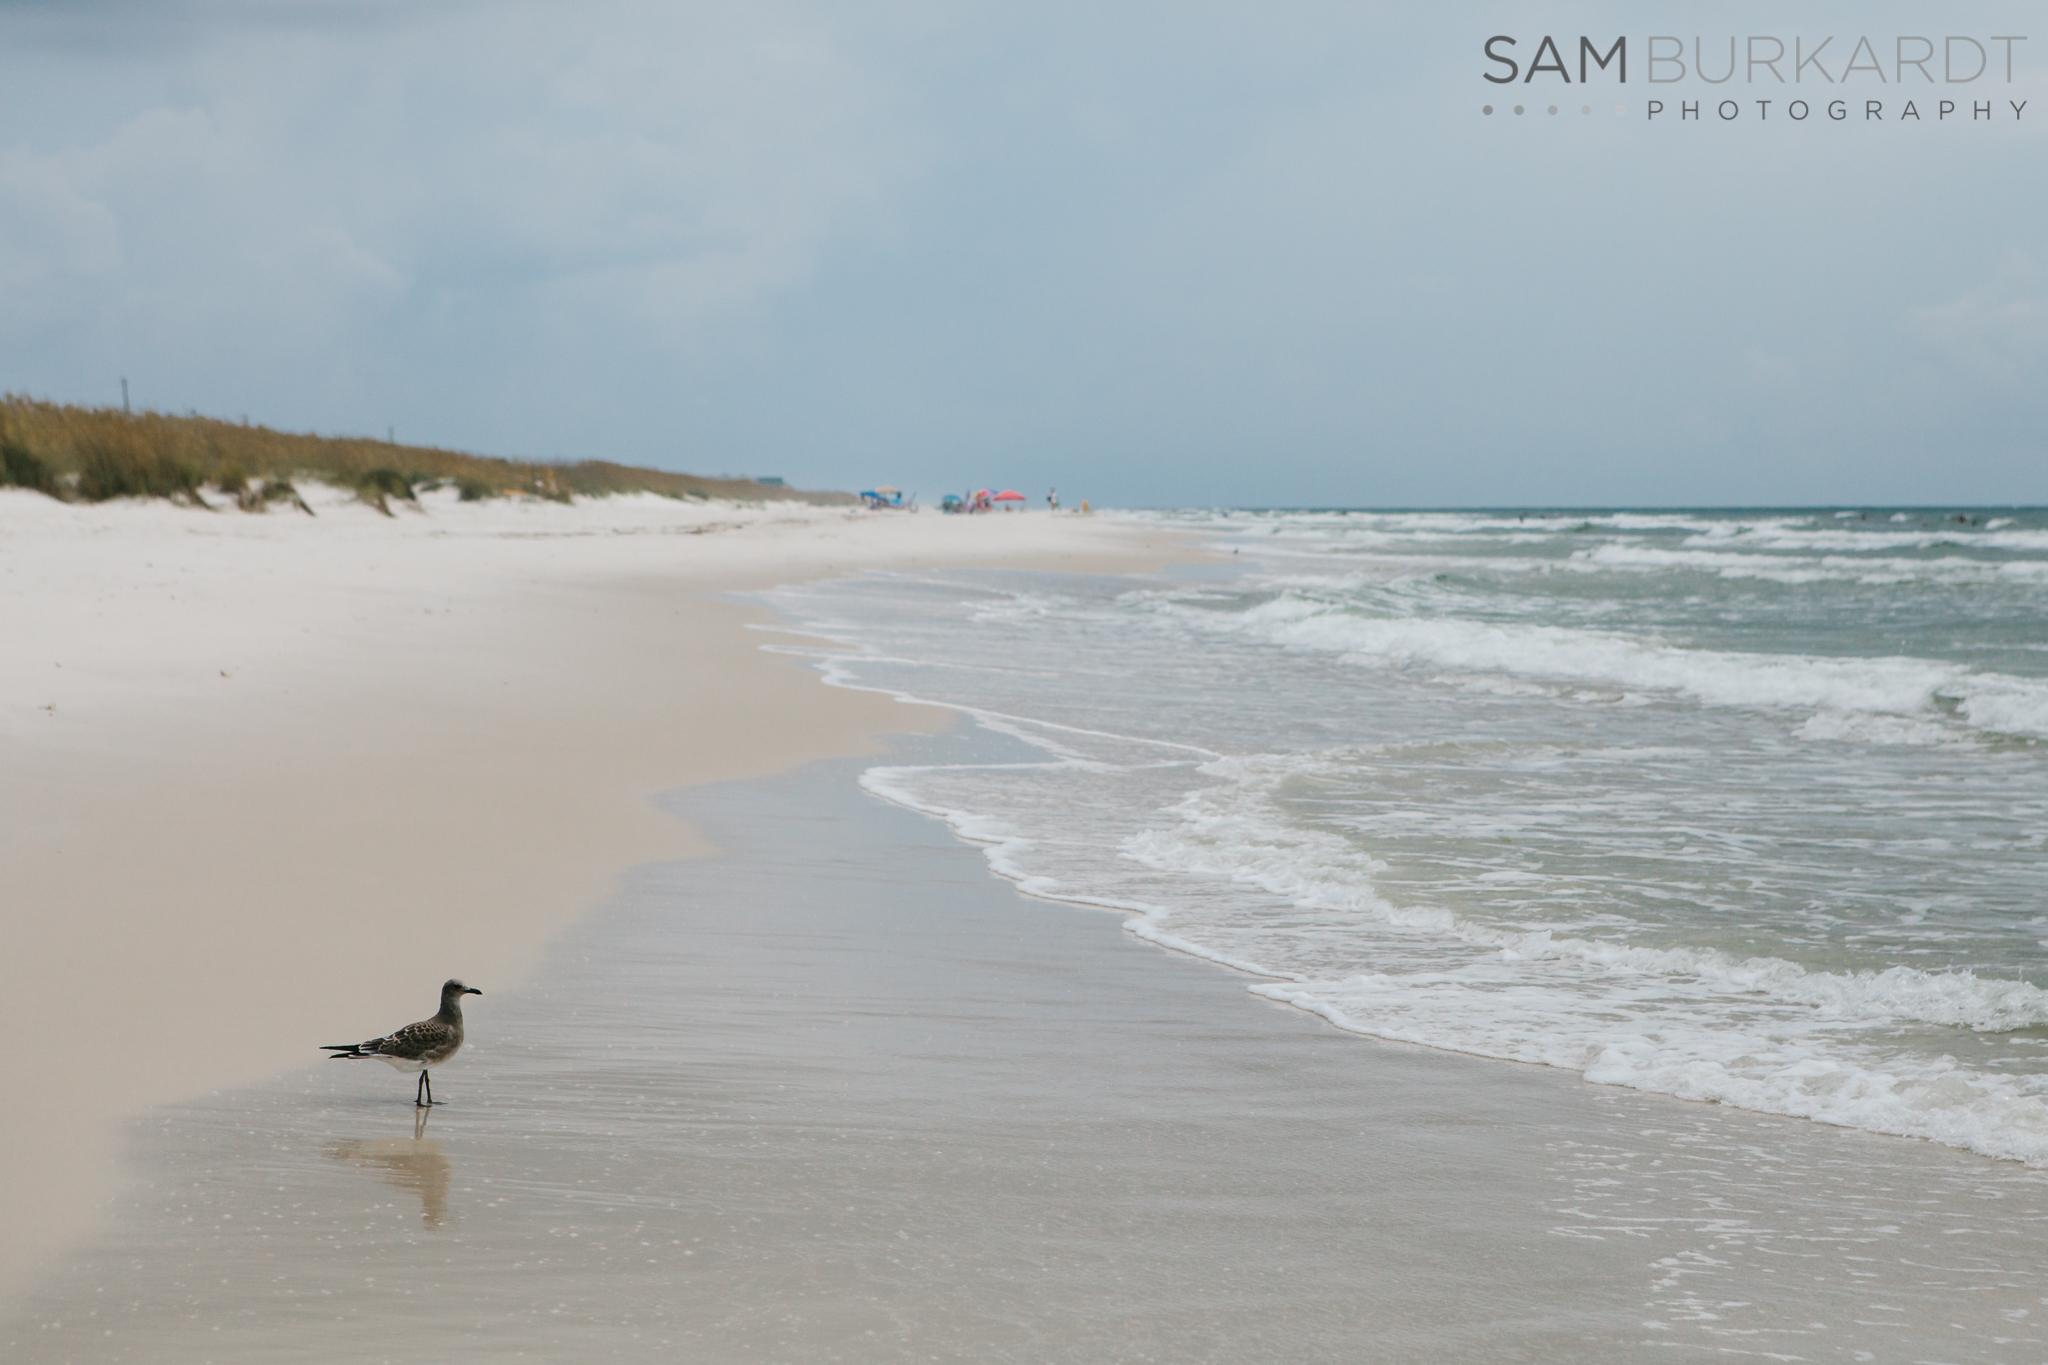 samburkardt_engagement_vacation_beach_cape_san_blas_florida_camping_gopro_0019.jpg